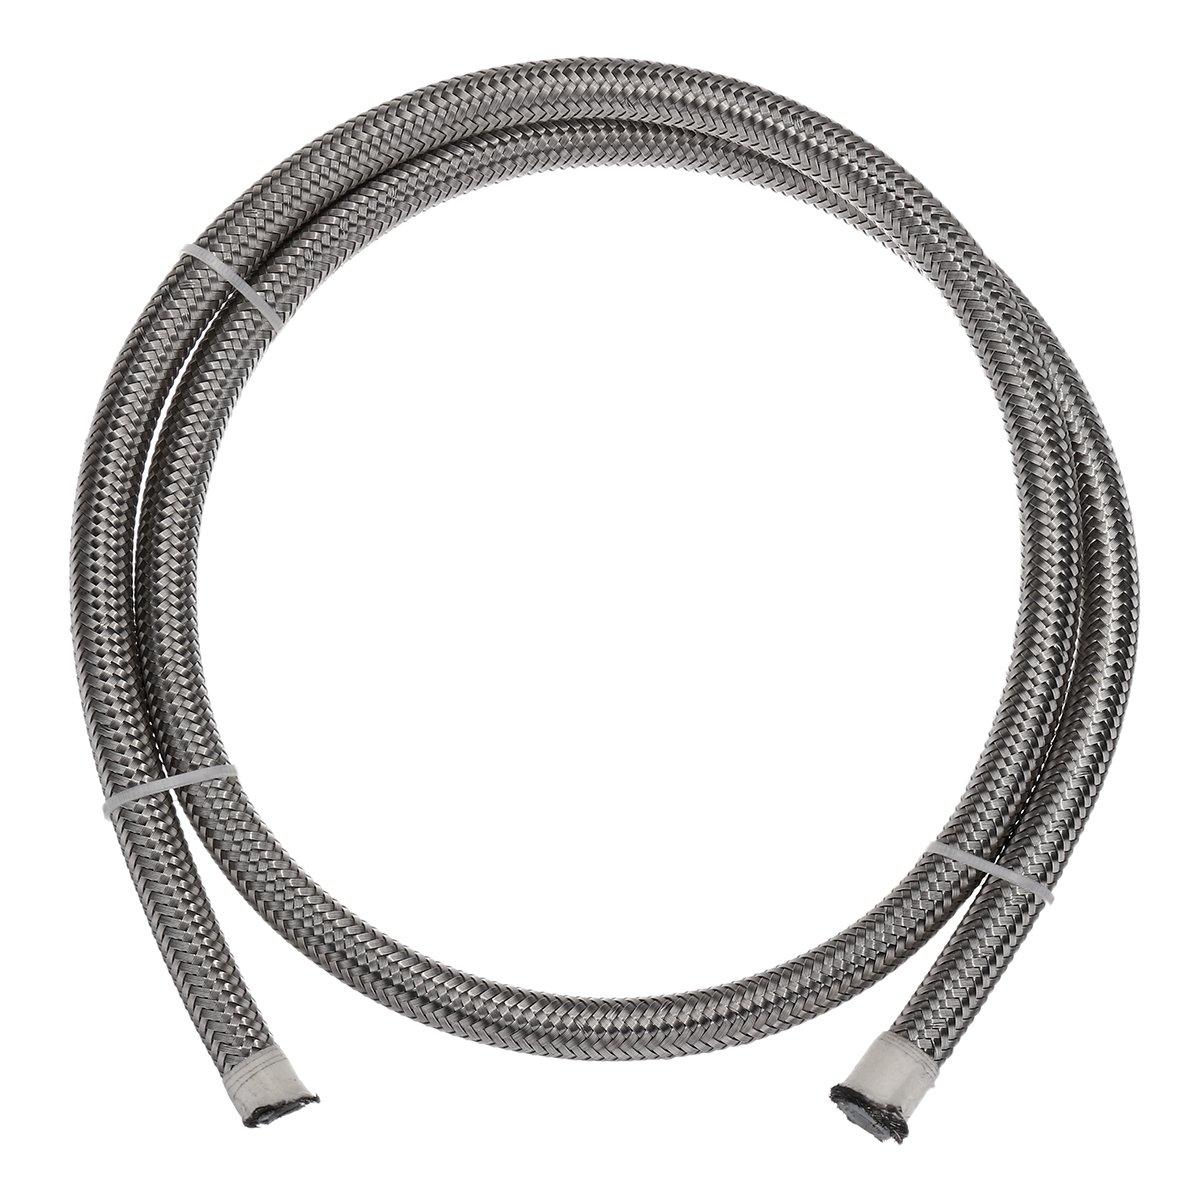 QOJA teflon stainless braided hose tube pipe line black for petrol